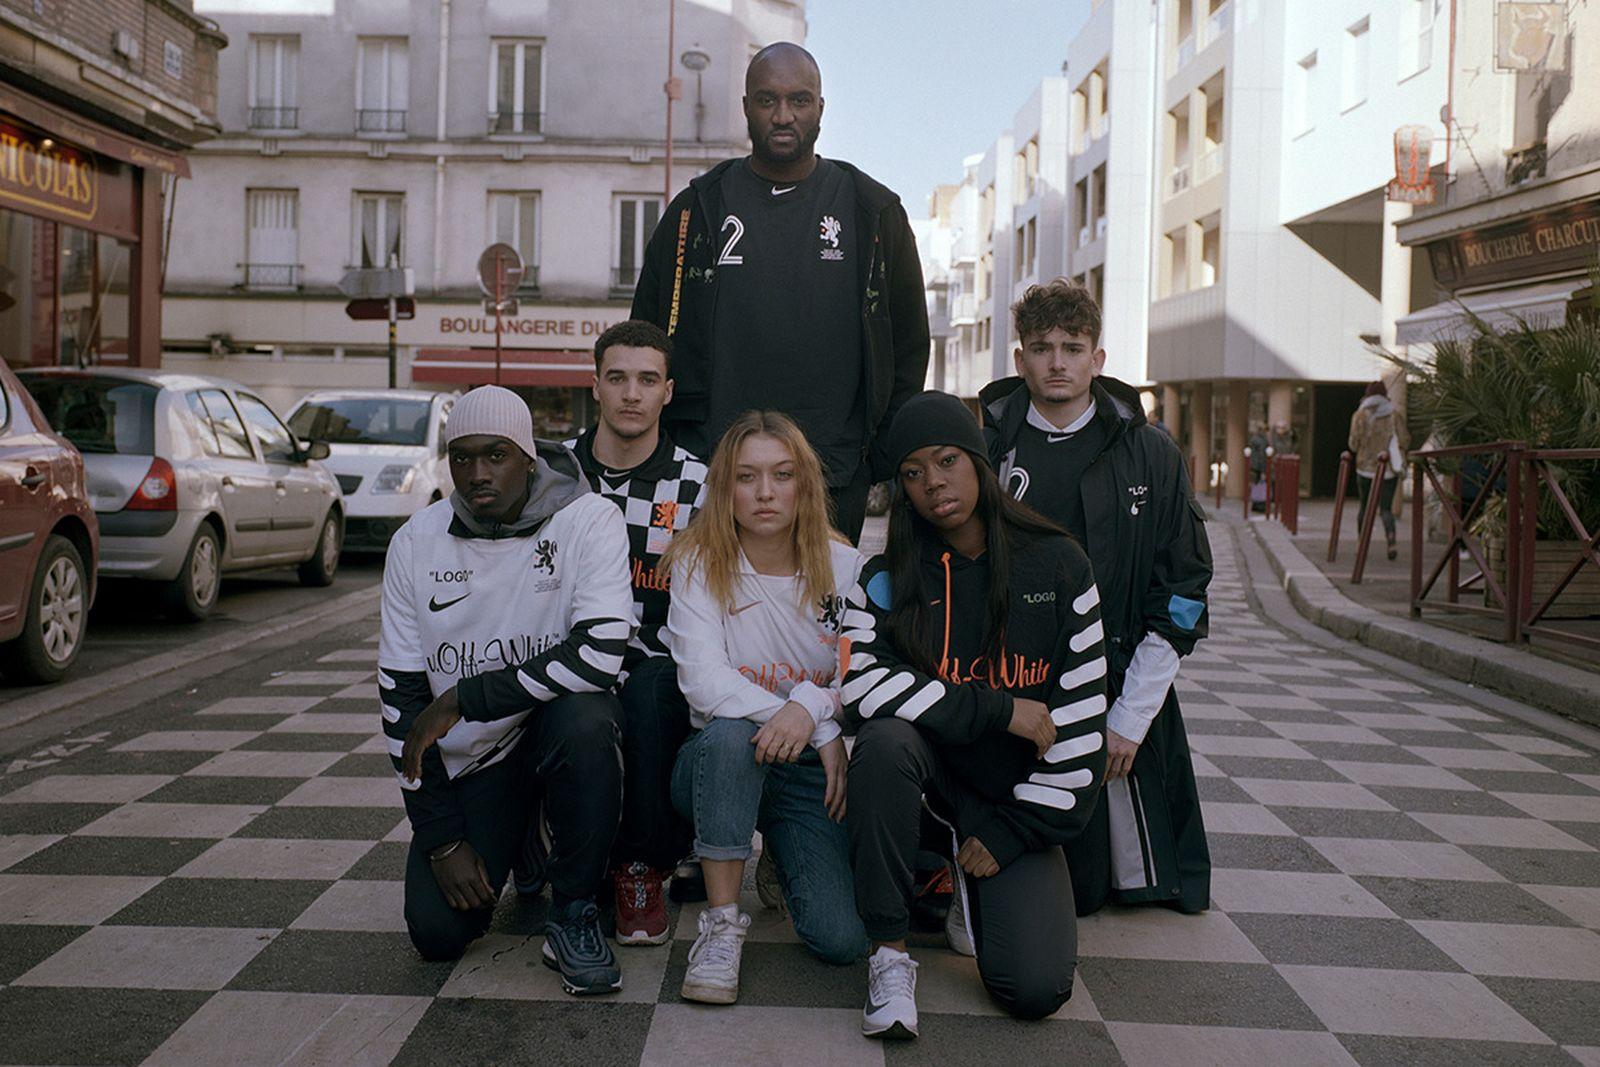 virgil-abloh-off-white-nike-football-interview-1